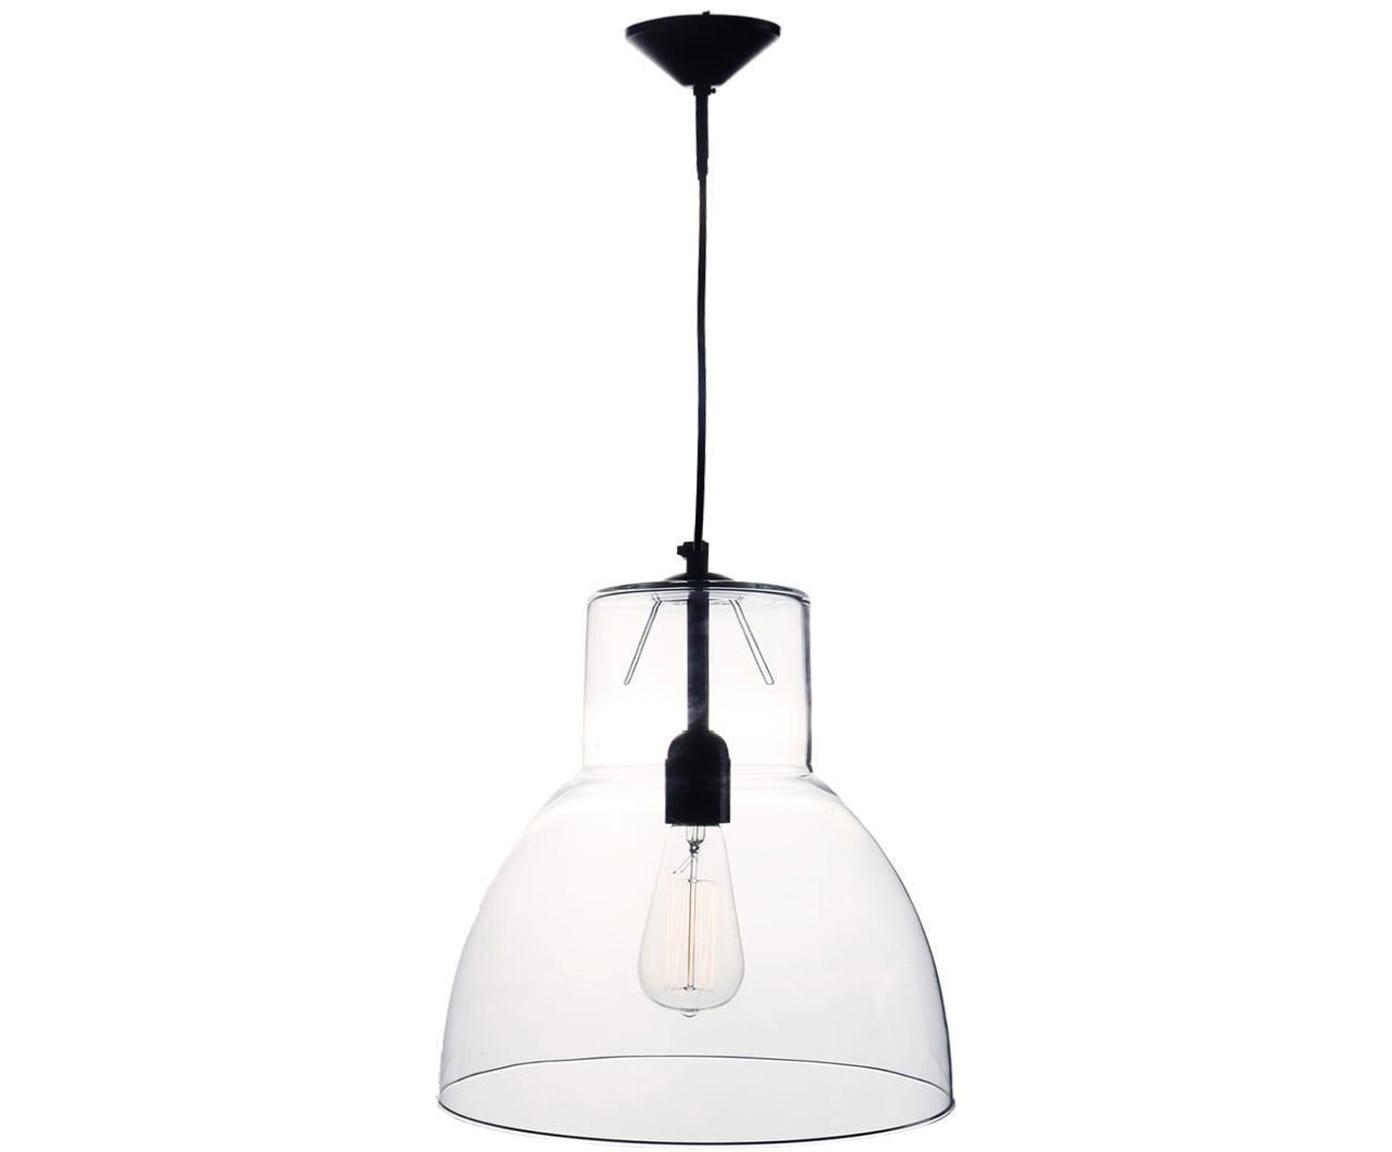 Lámpara de techo Winston, Pantalla: vidrio, Transparente, negro, Ø 30 x Al 35 cm